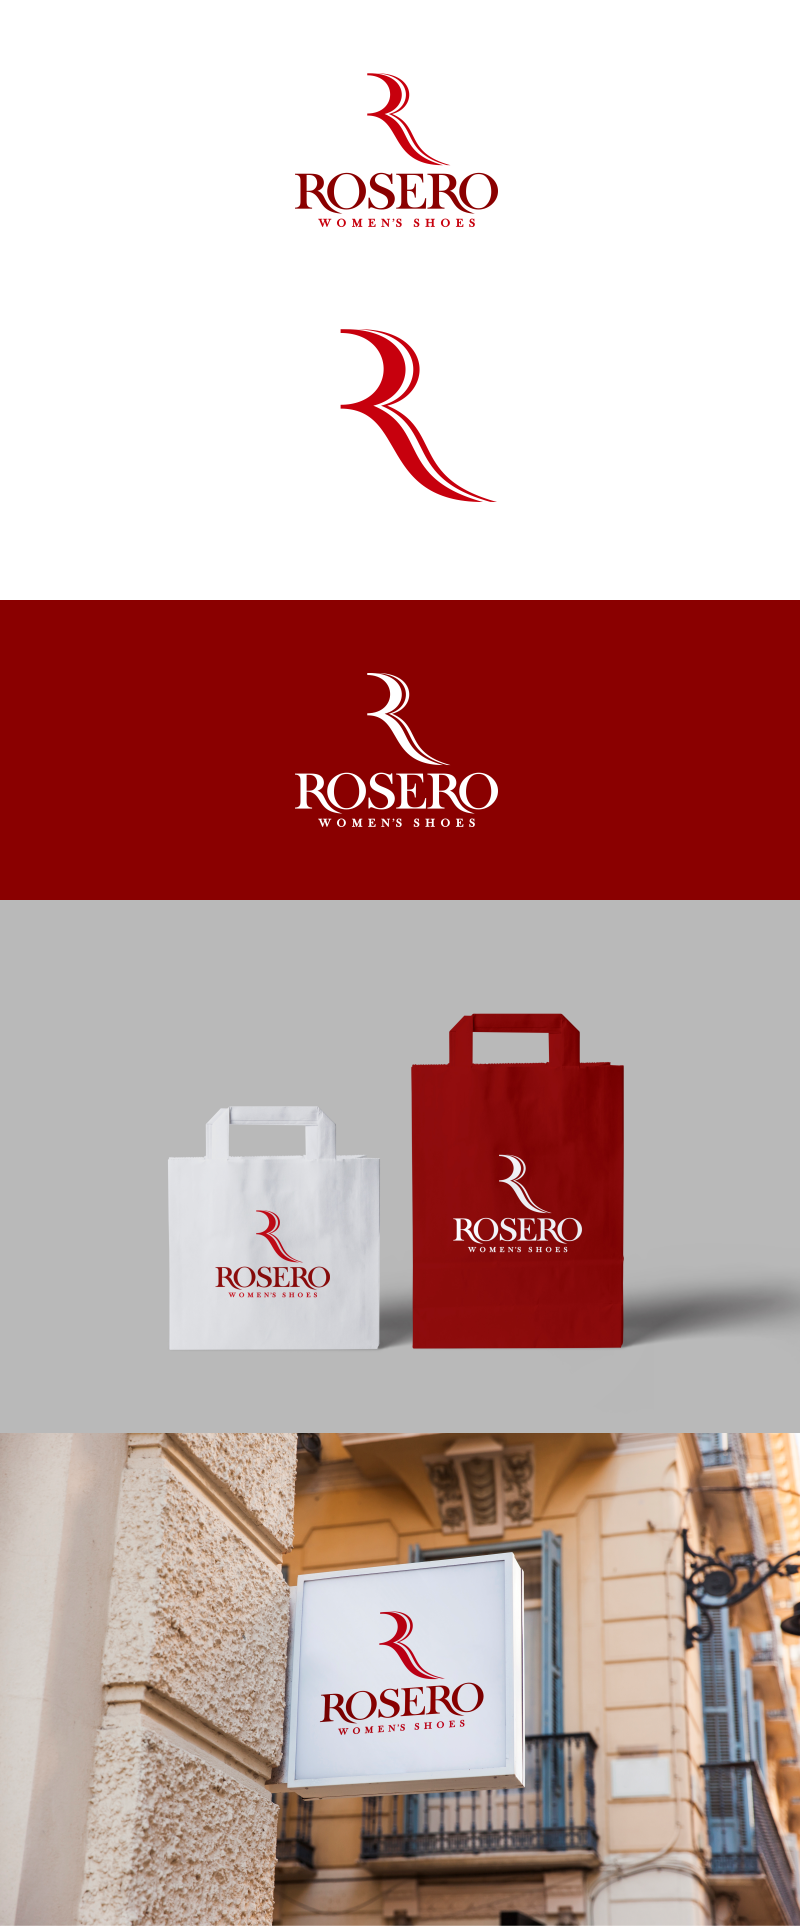 Rosero